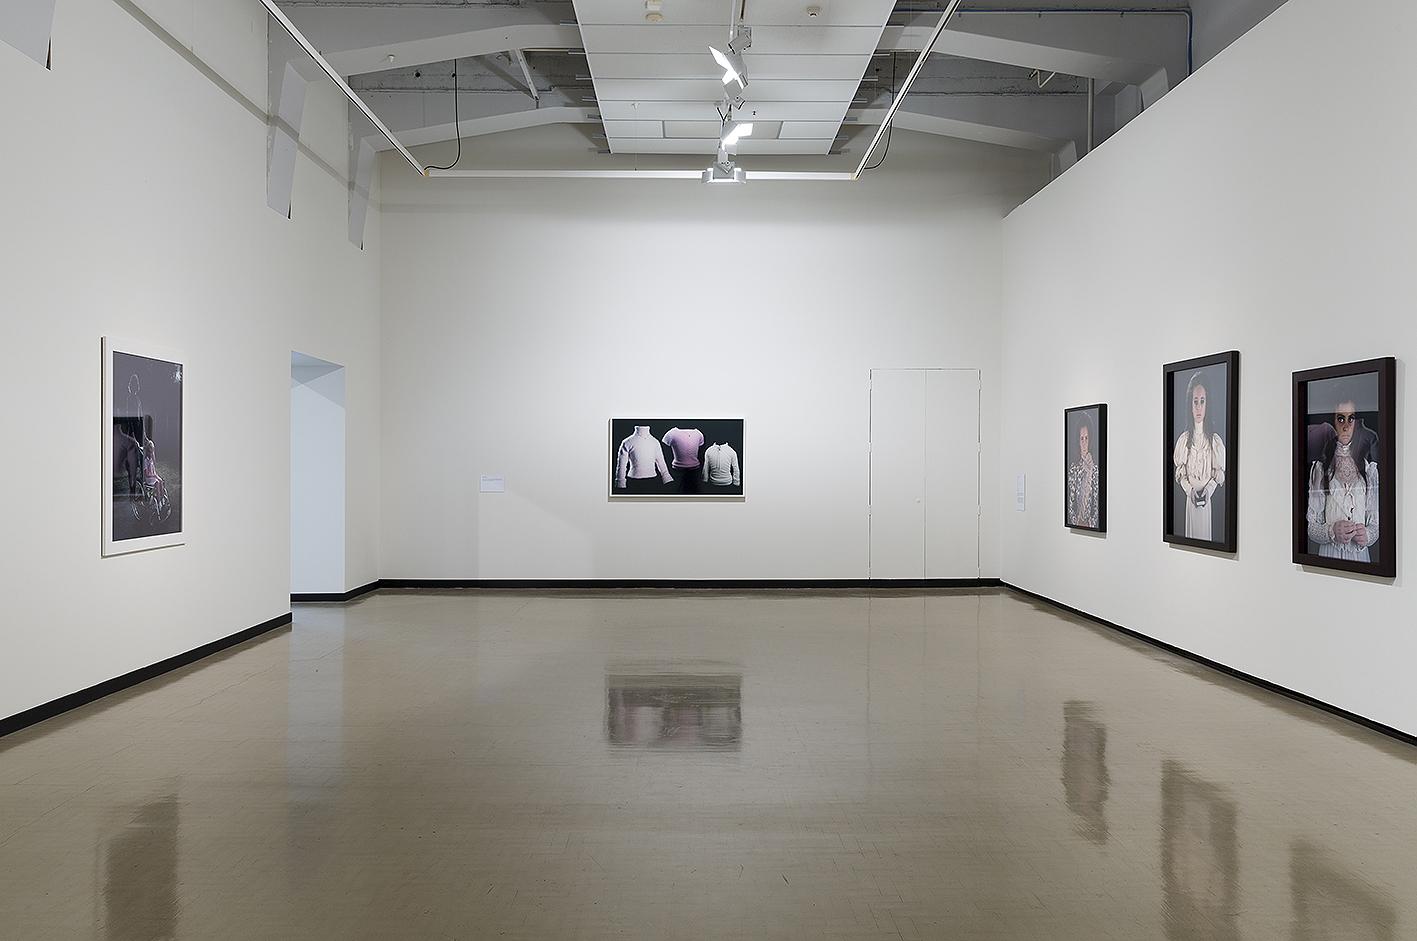 City Gallery_Yvonne Todd_Creamy Psychology_documentation_hiRez_042.jpg